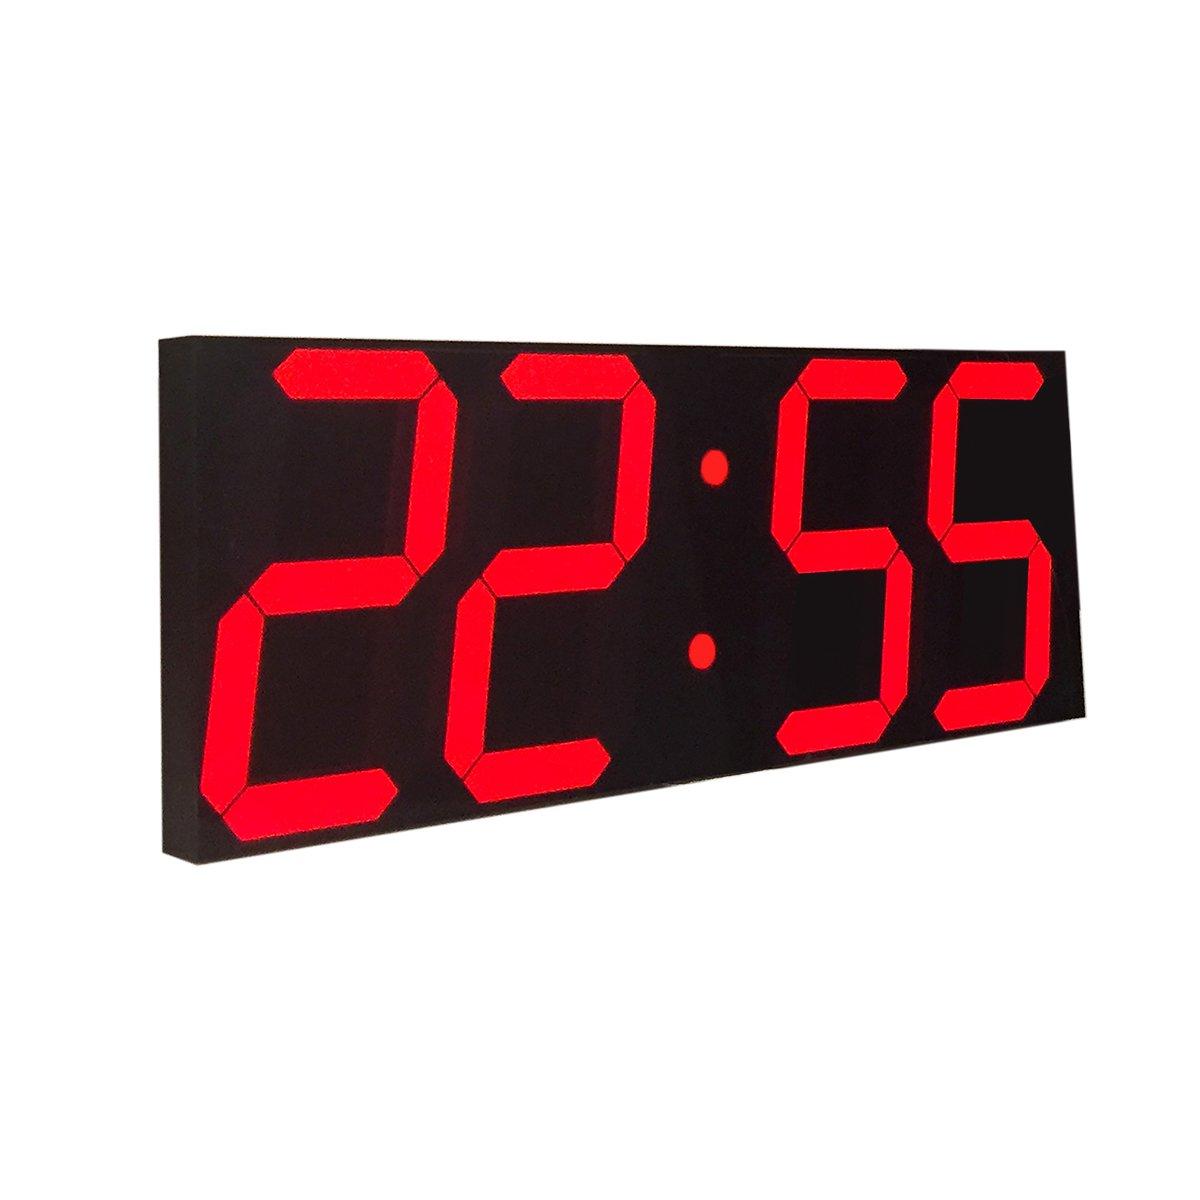 Amazon.com: goetland 16 3 4 jumbo wall clock led digital multi